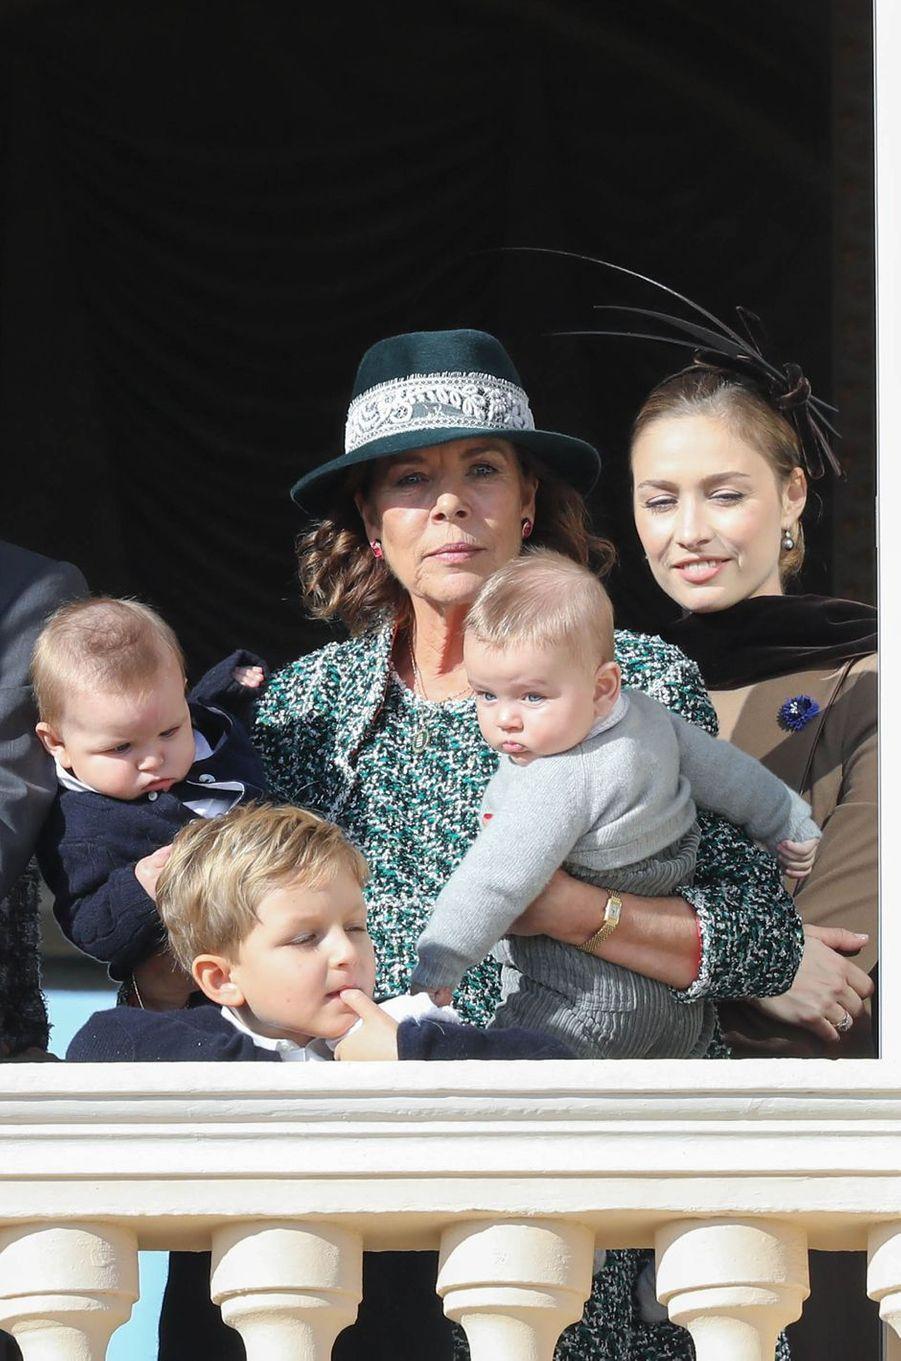 La princesse Caroline de Hanovre avec ses petits-fils Maximilian, Andrea et Francesco Casiraghi et Beatrice Borromeo-Casiraghi, à Monaco le 19 novembre 2018